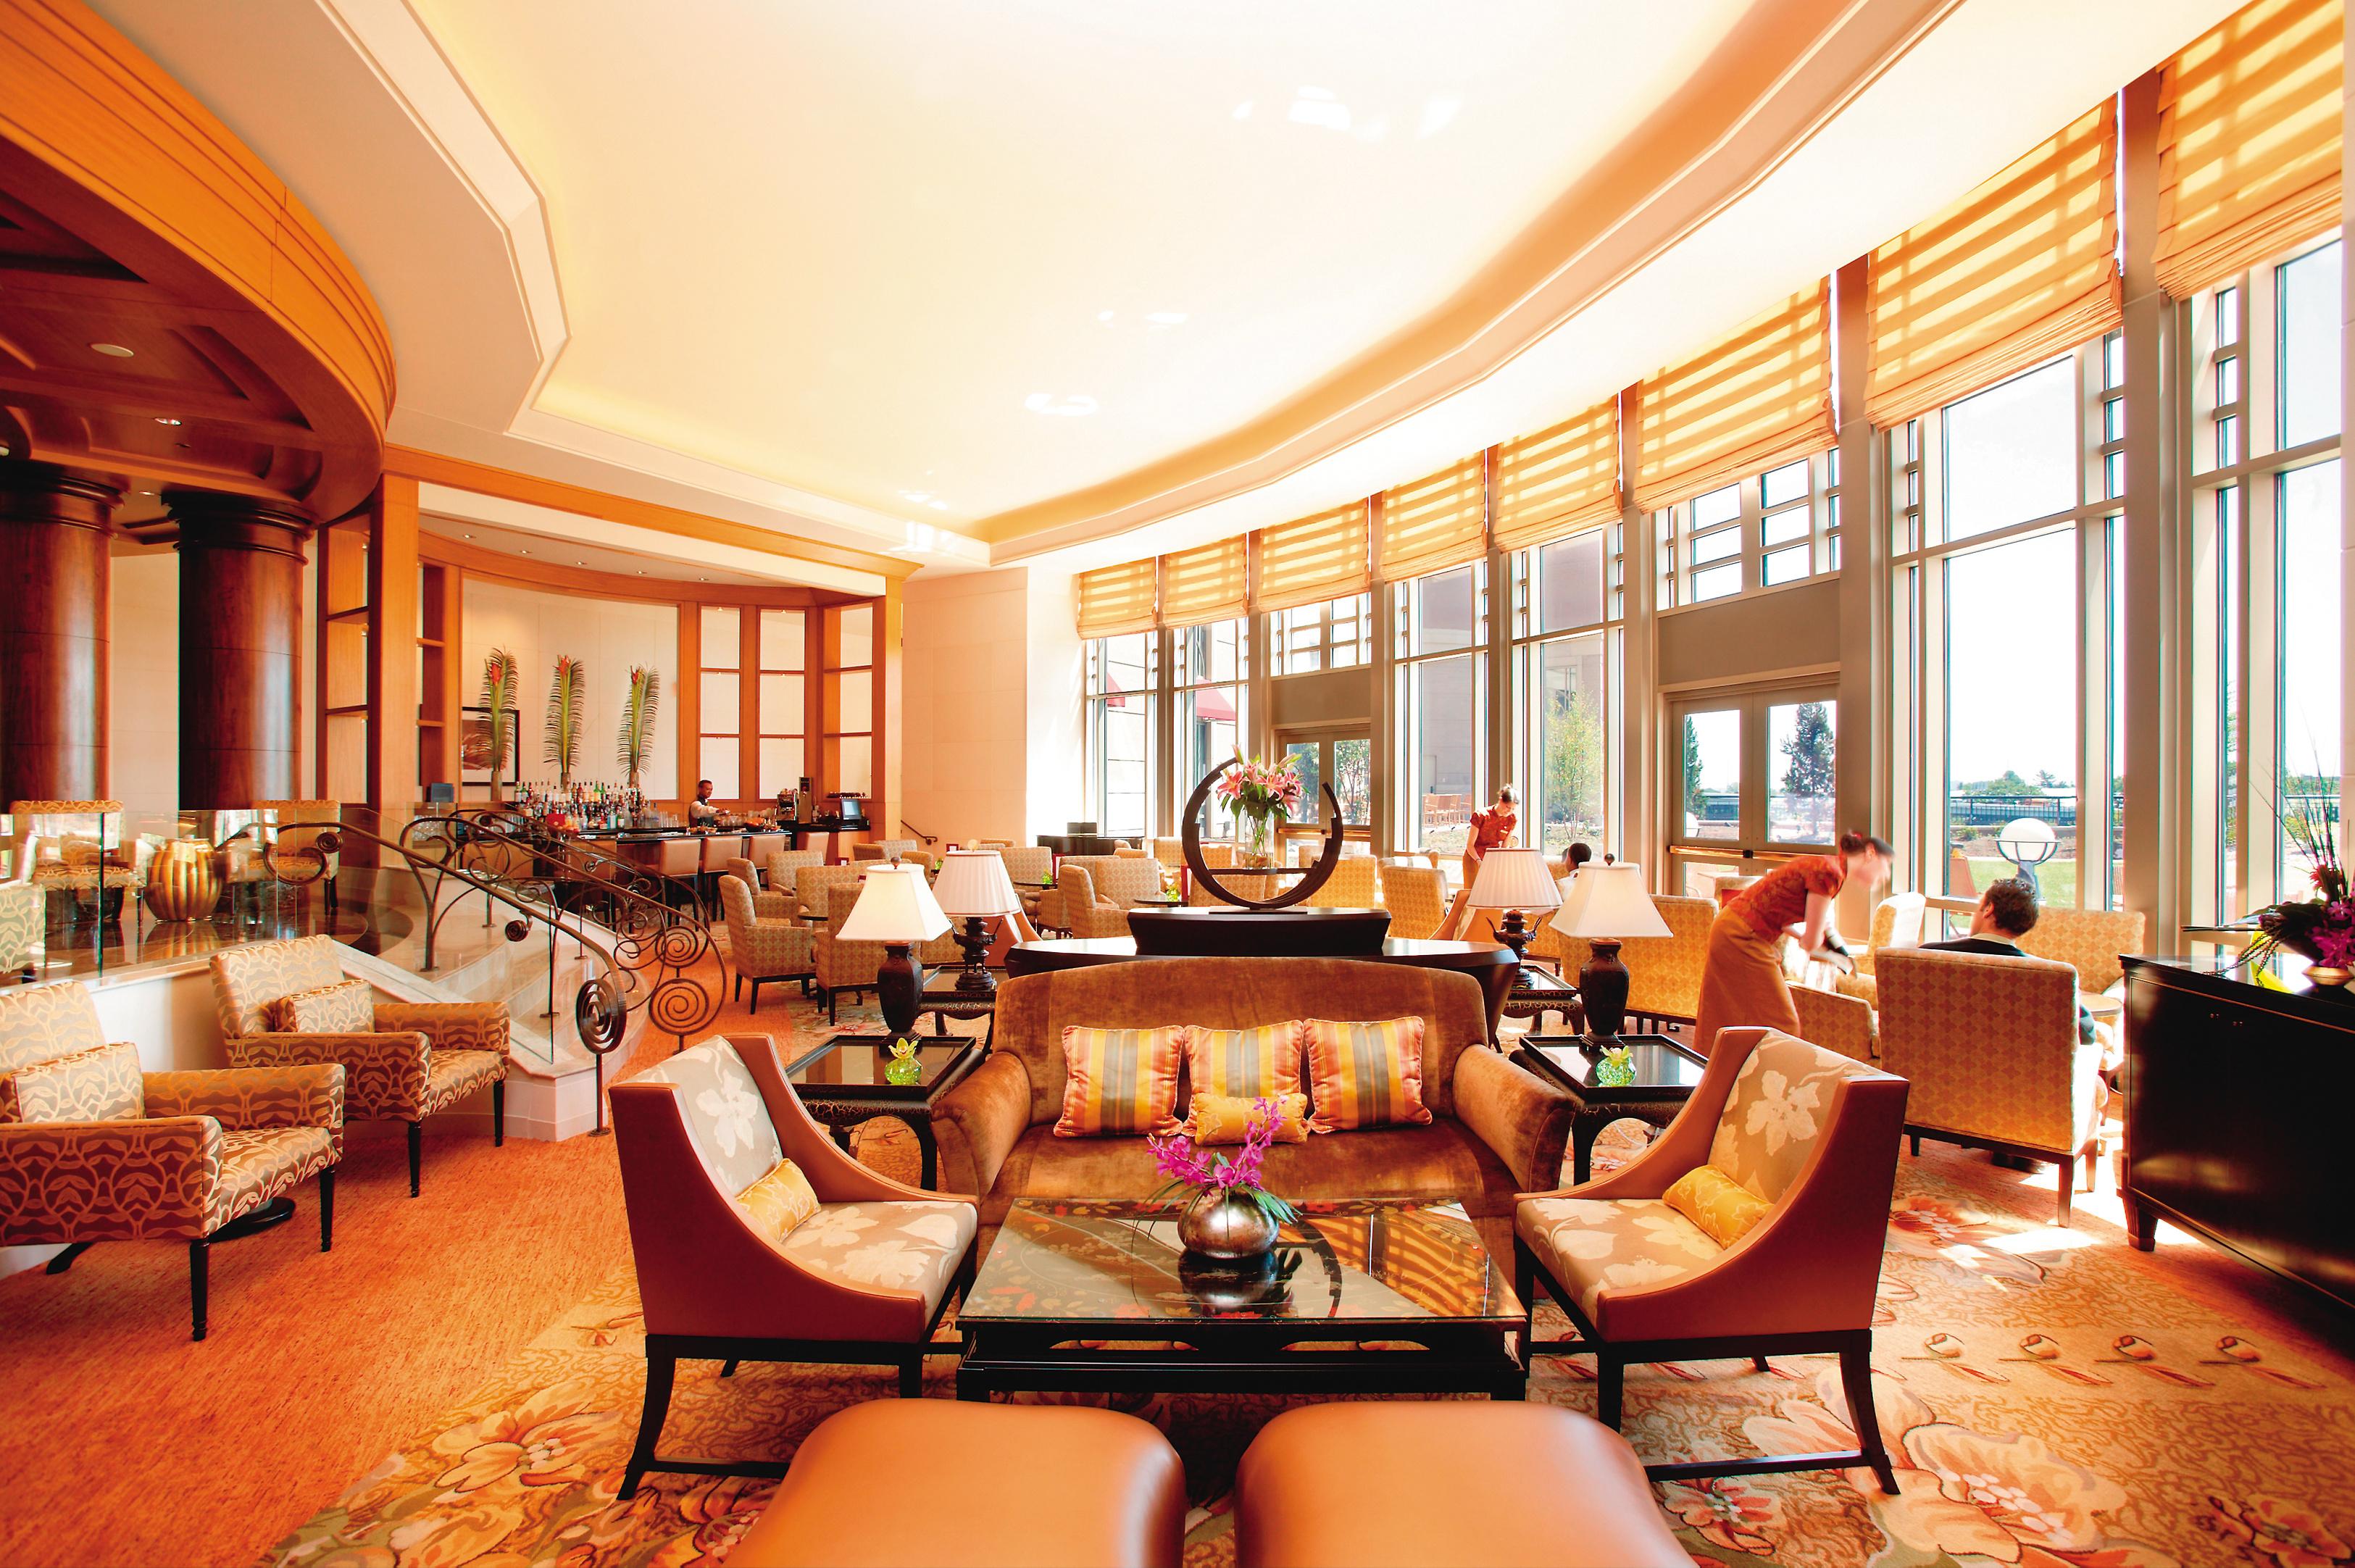 Mandarin Oriental Washington DC Debut Muze Restaurant  wwwfashionlifestylewordpresscom